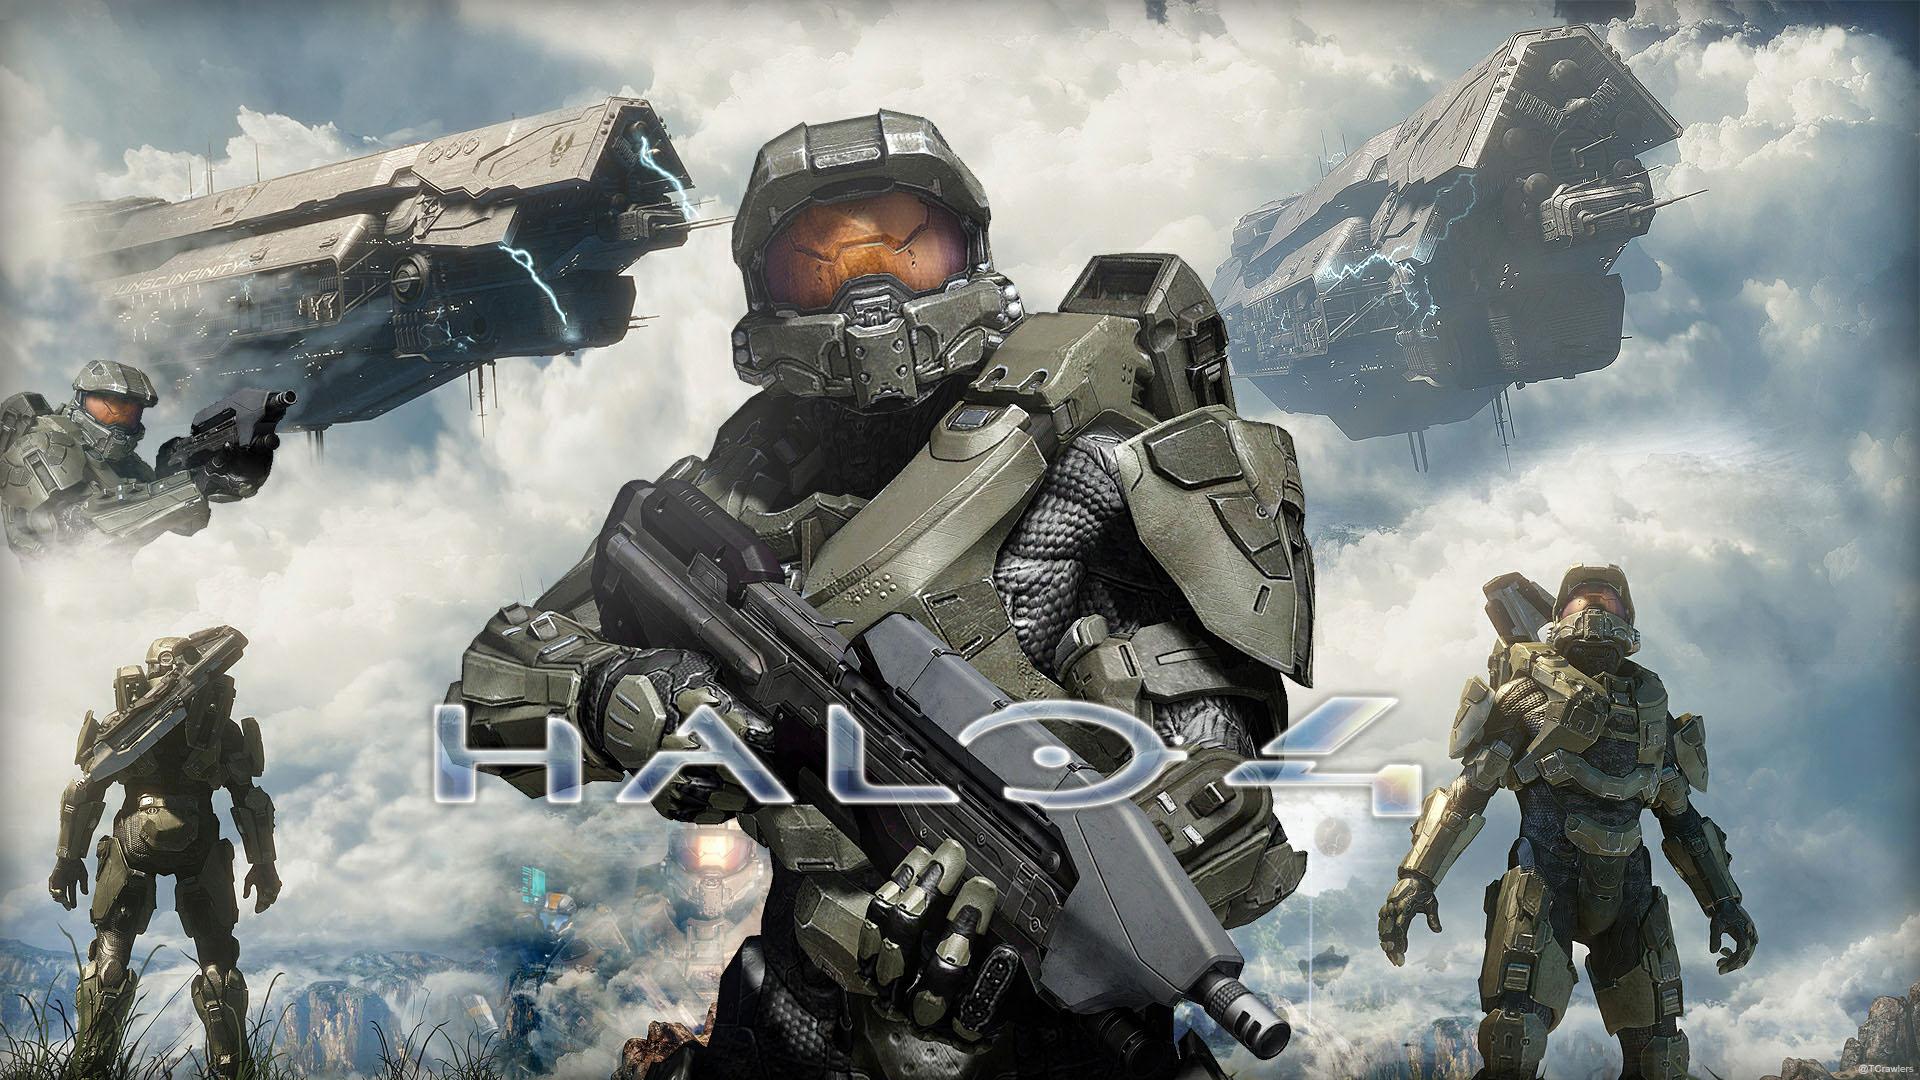 Halo 4 fond d 39 cran hd - Halo 5 screensaver ...